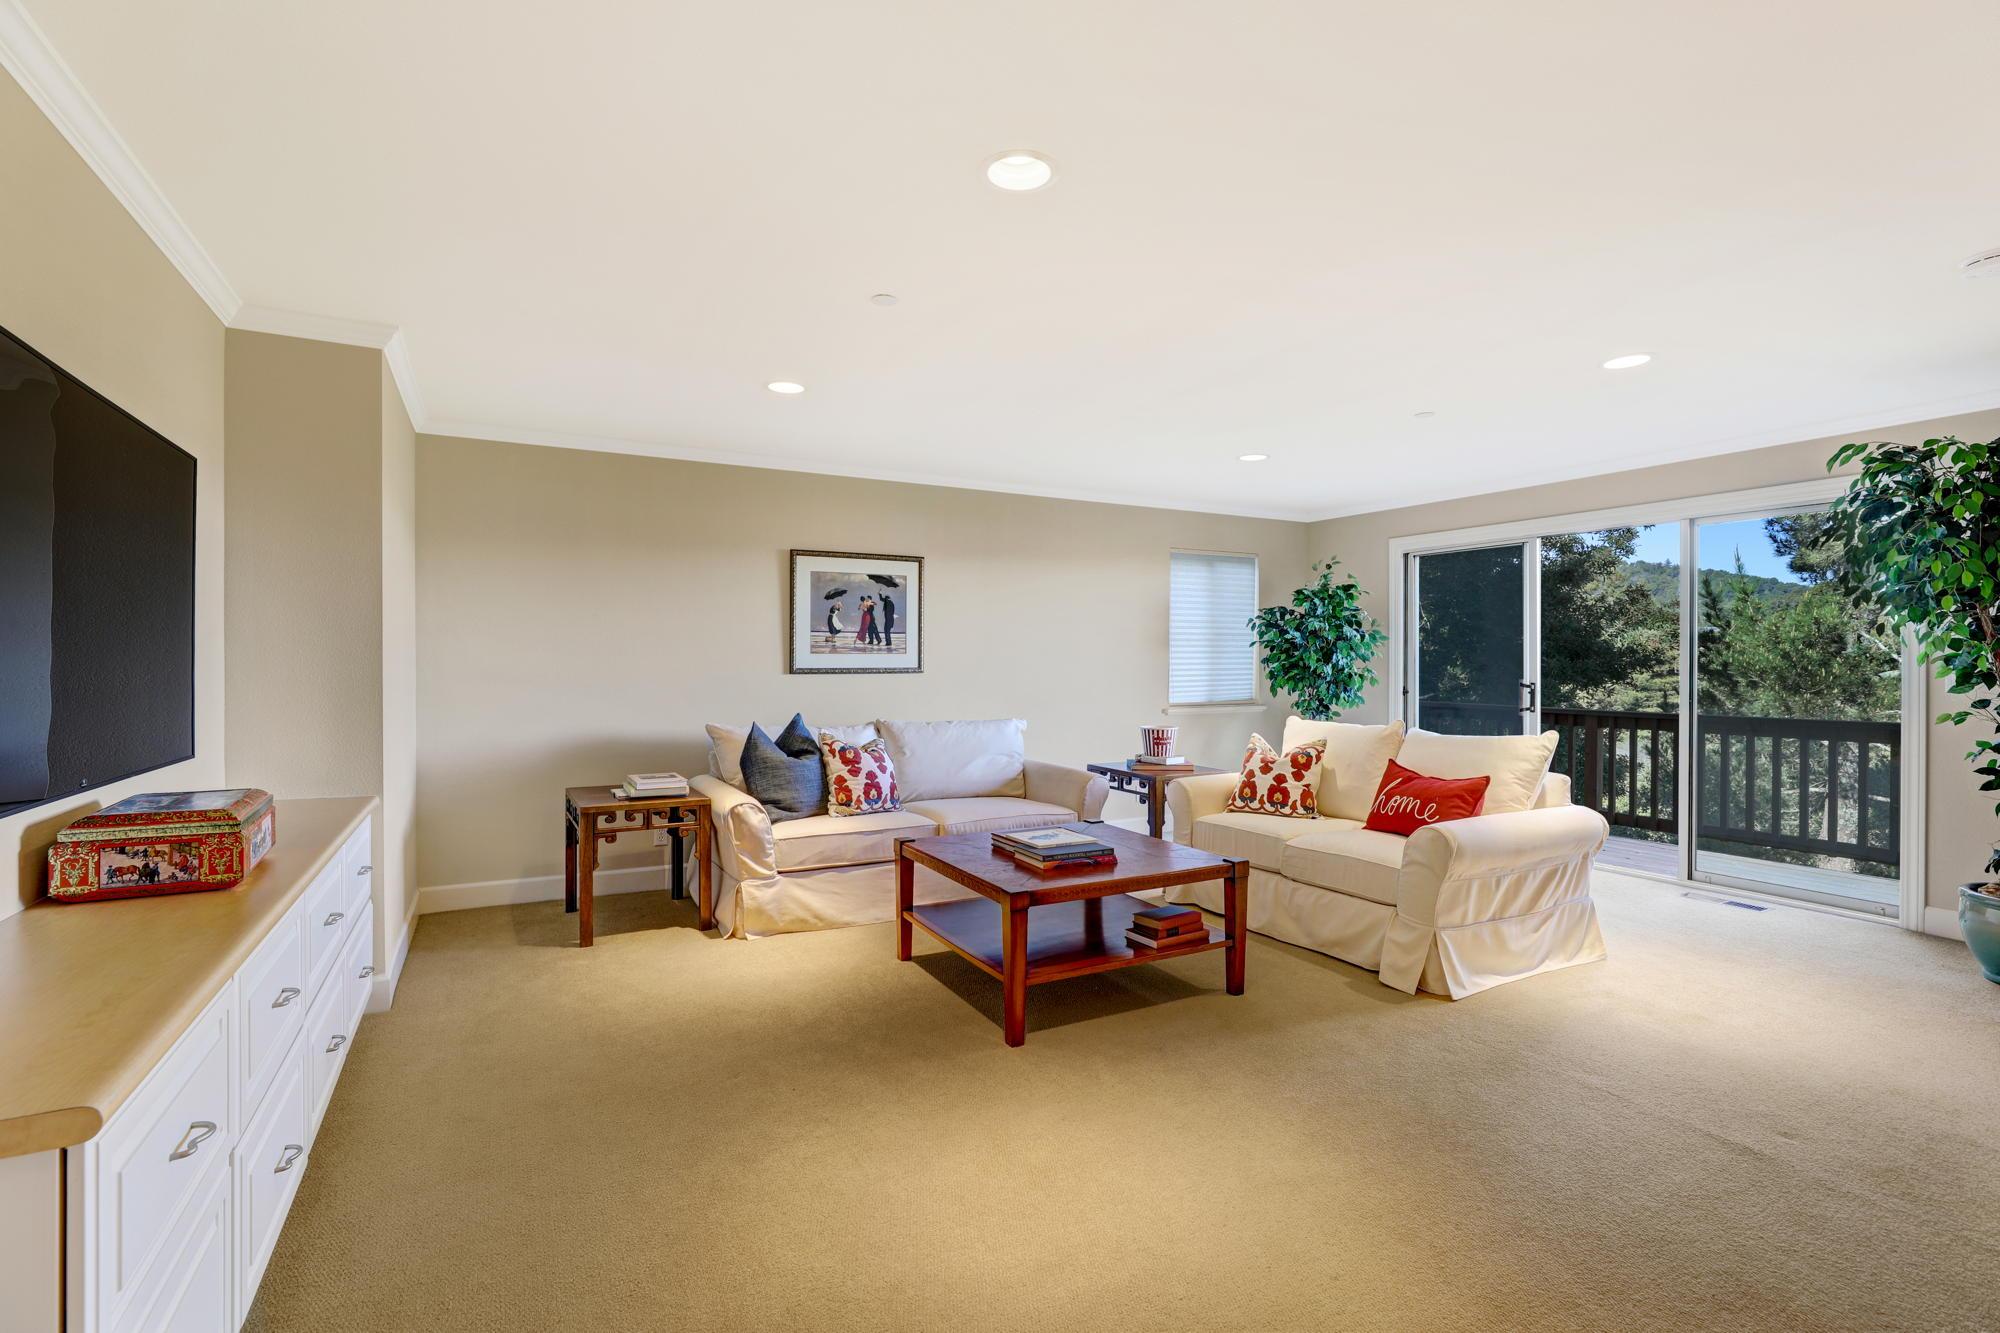 231 Marin Vista Larkspur #1 Realtor - 40 - Own Marin with Compass Real Estate.jpg